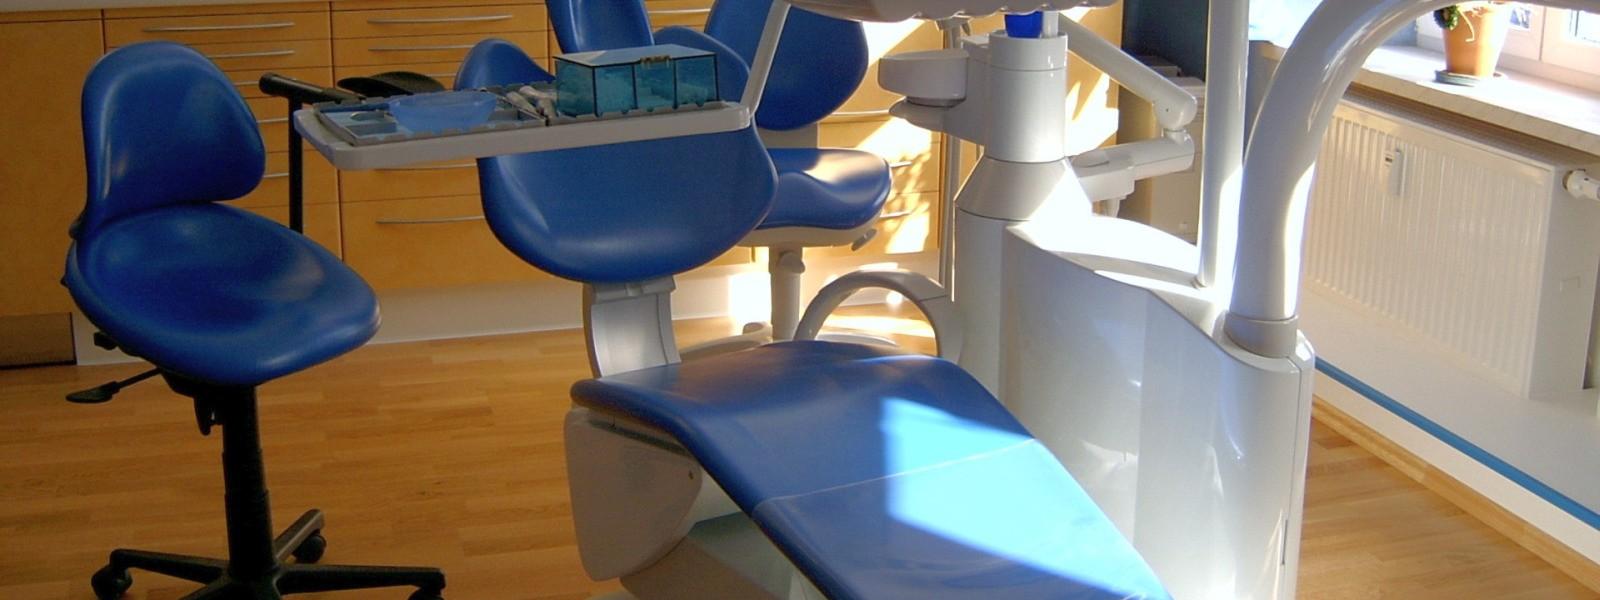 guastalla-reggio-emilia-dentista-odontoiatra